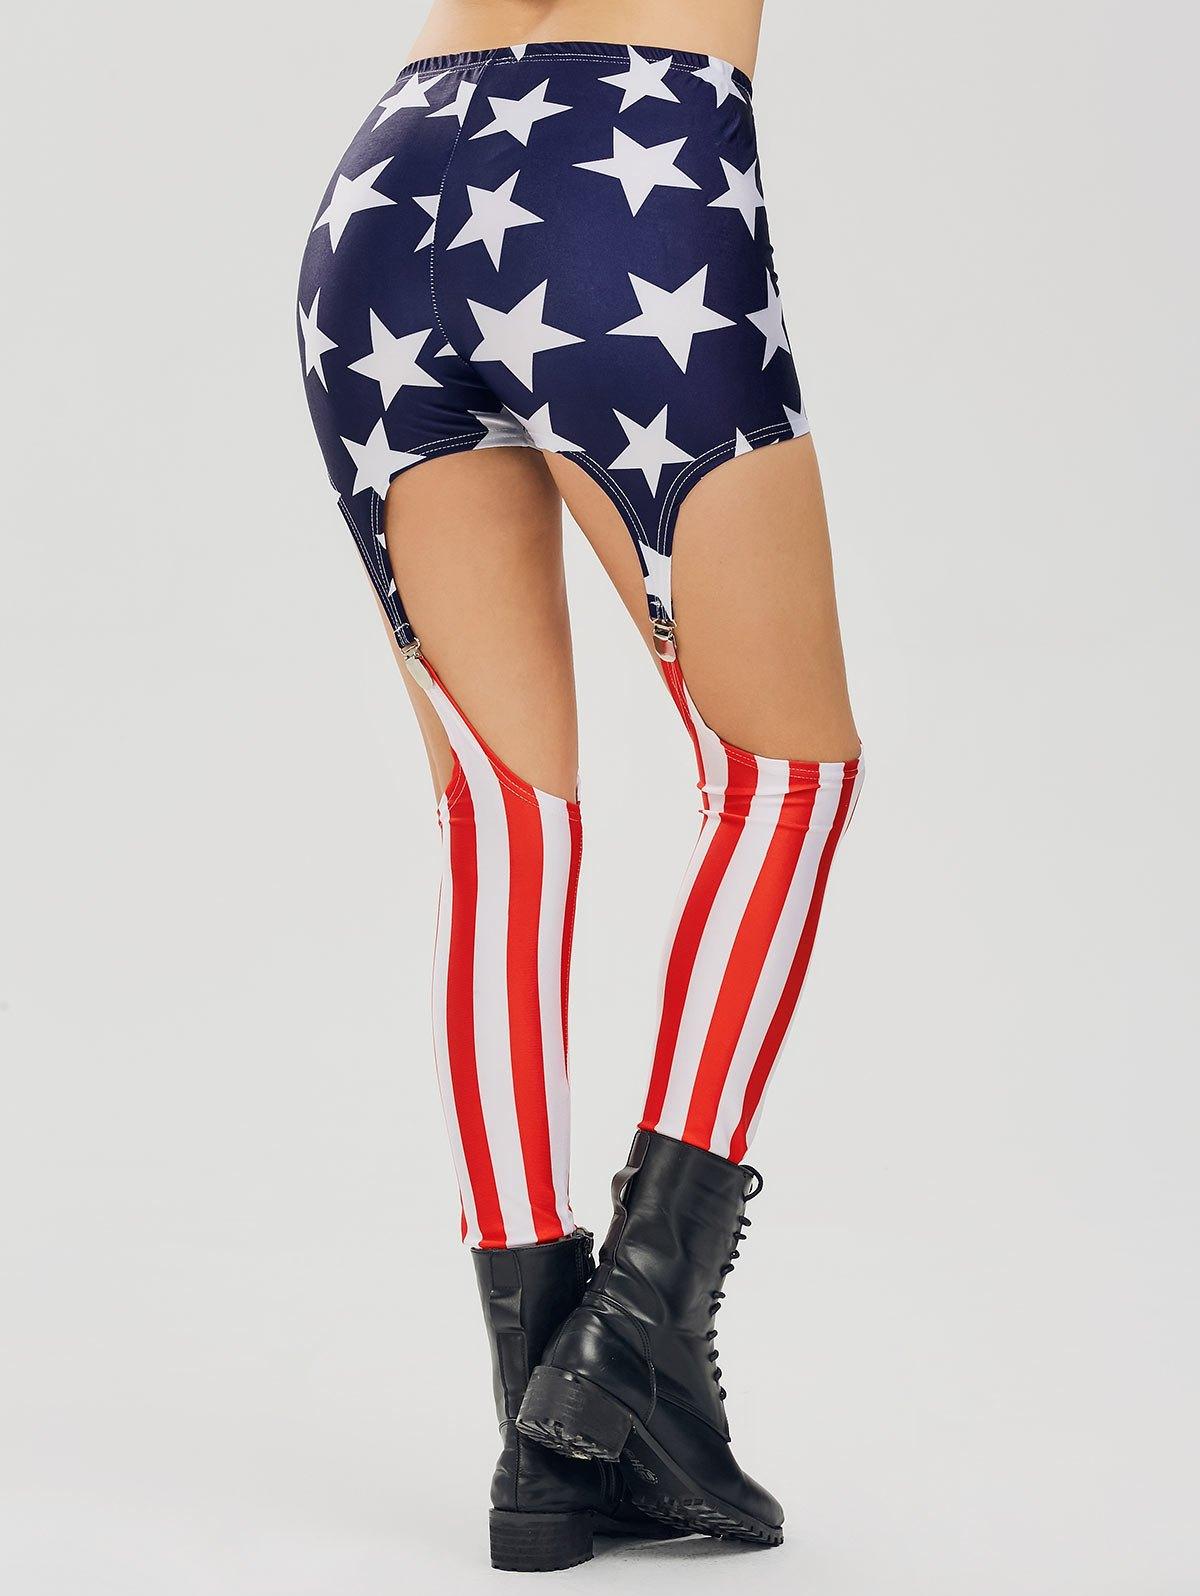 Cut Out American Flag Patriotic Leggings - Colormix M